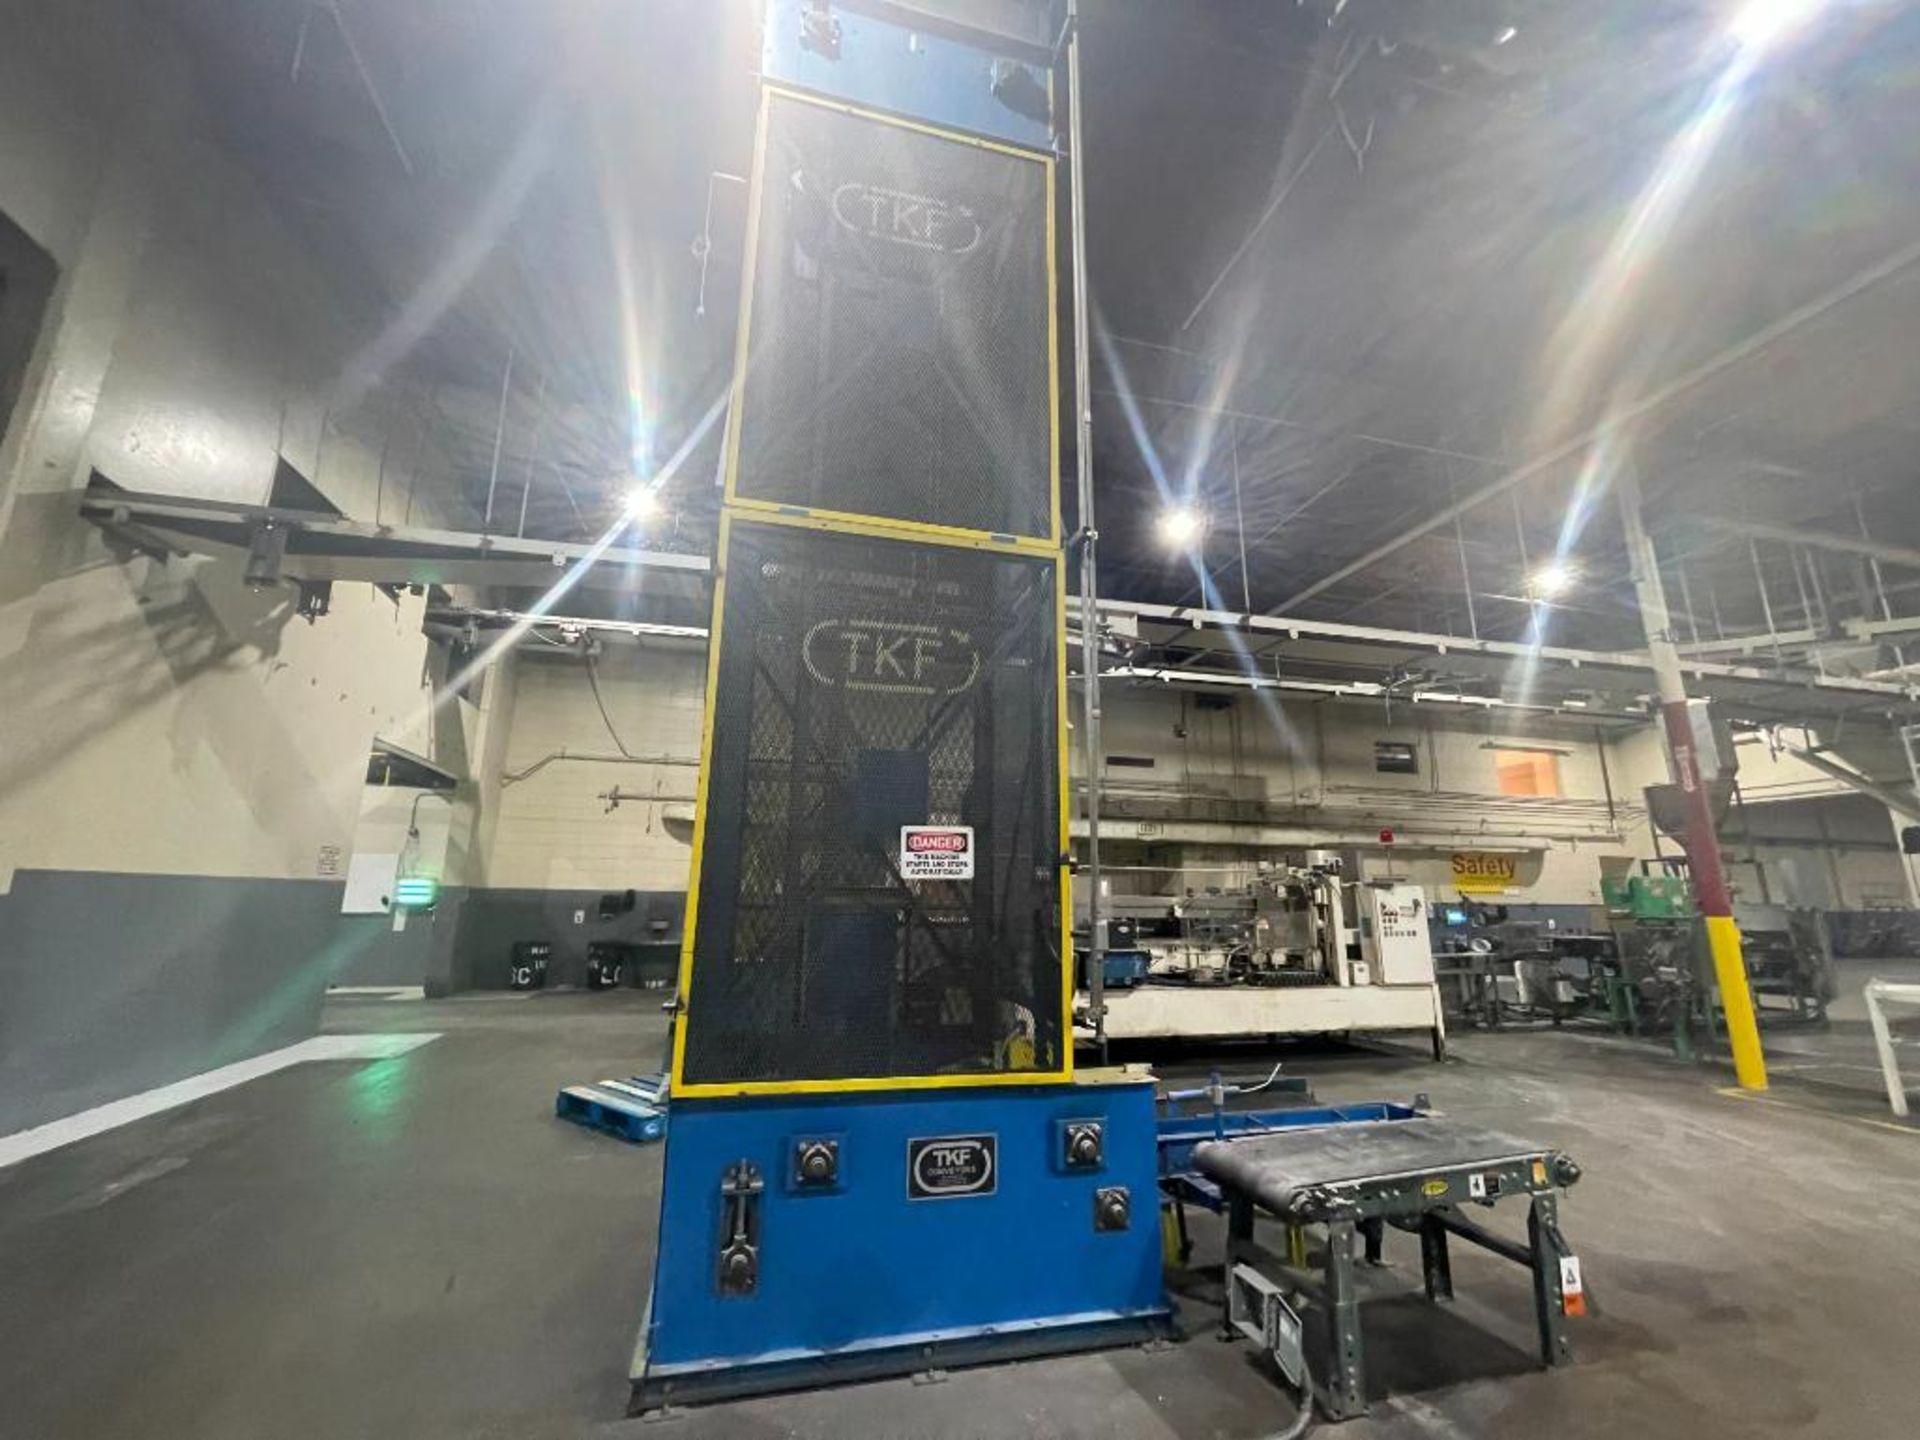 TKF vertical case elevator parts - Image 9 of 14